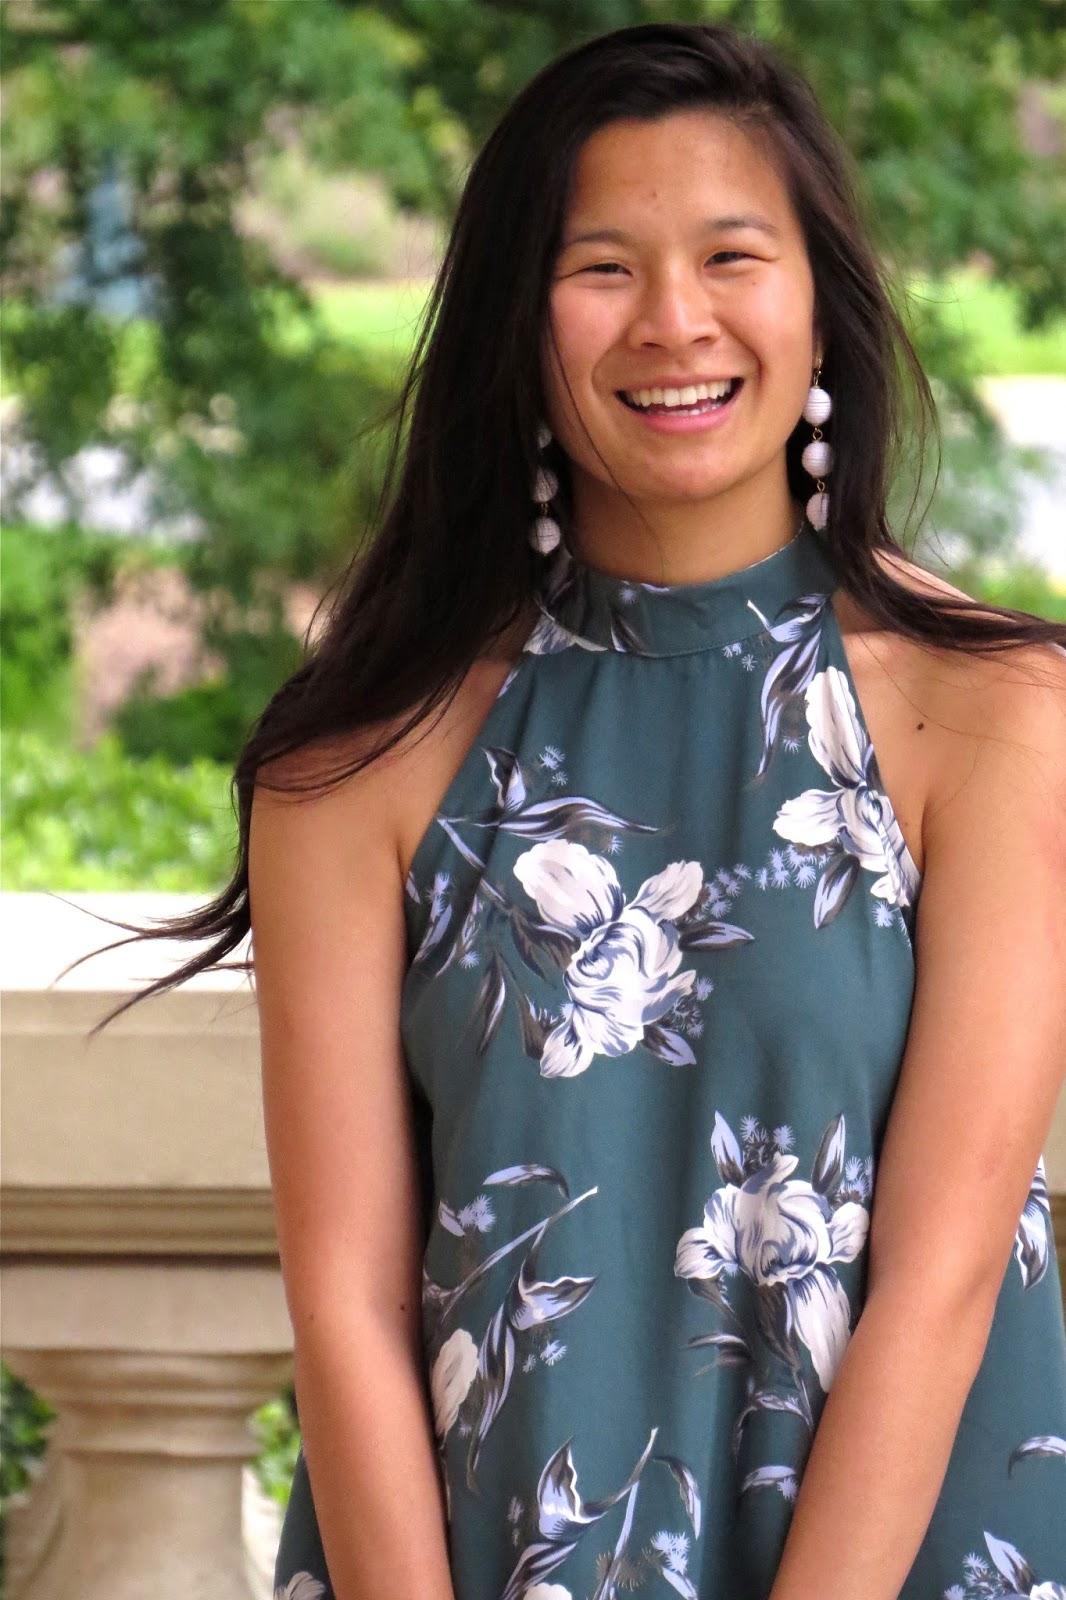 Green_floral_dress